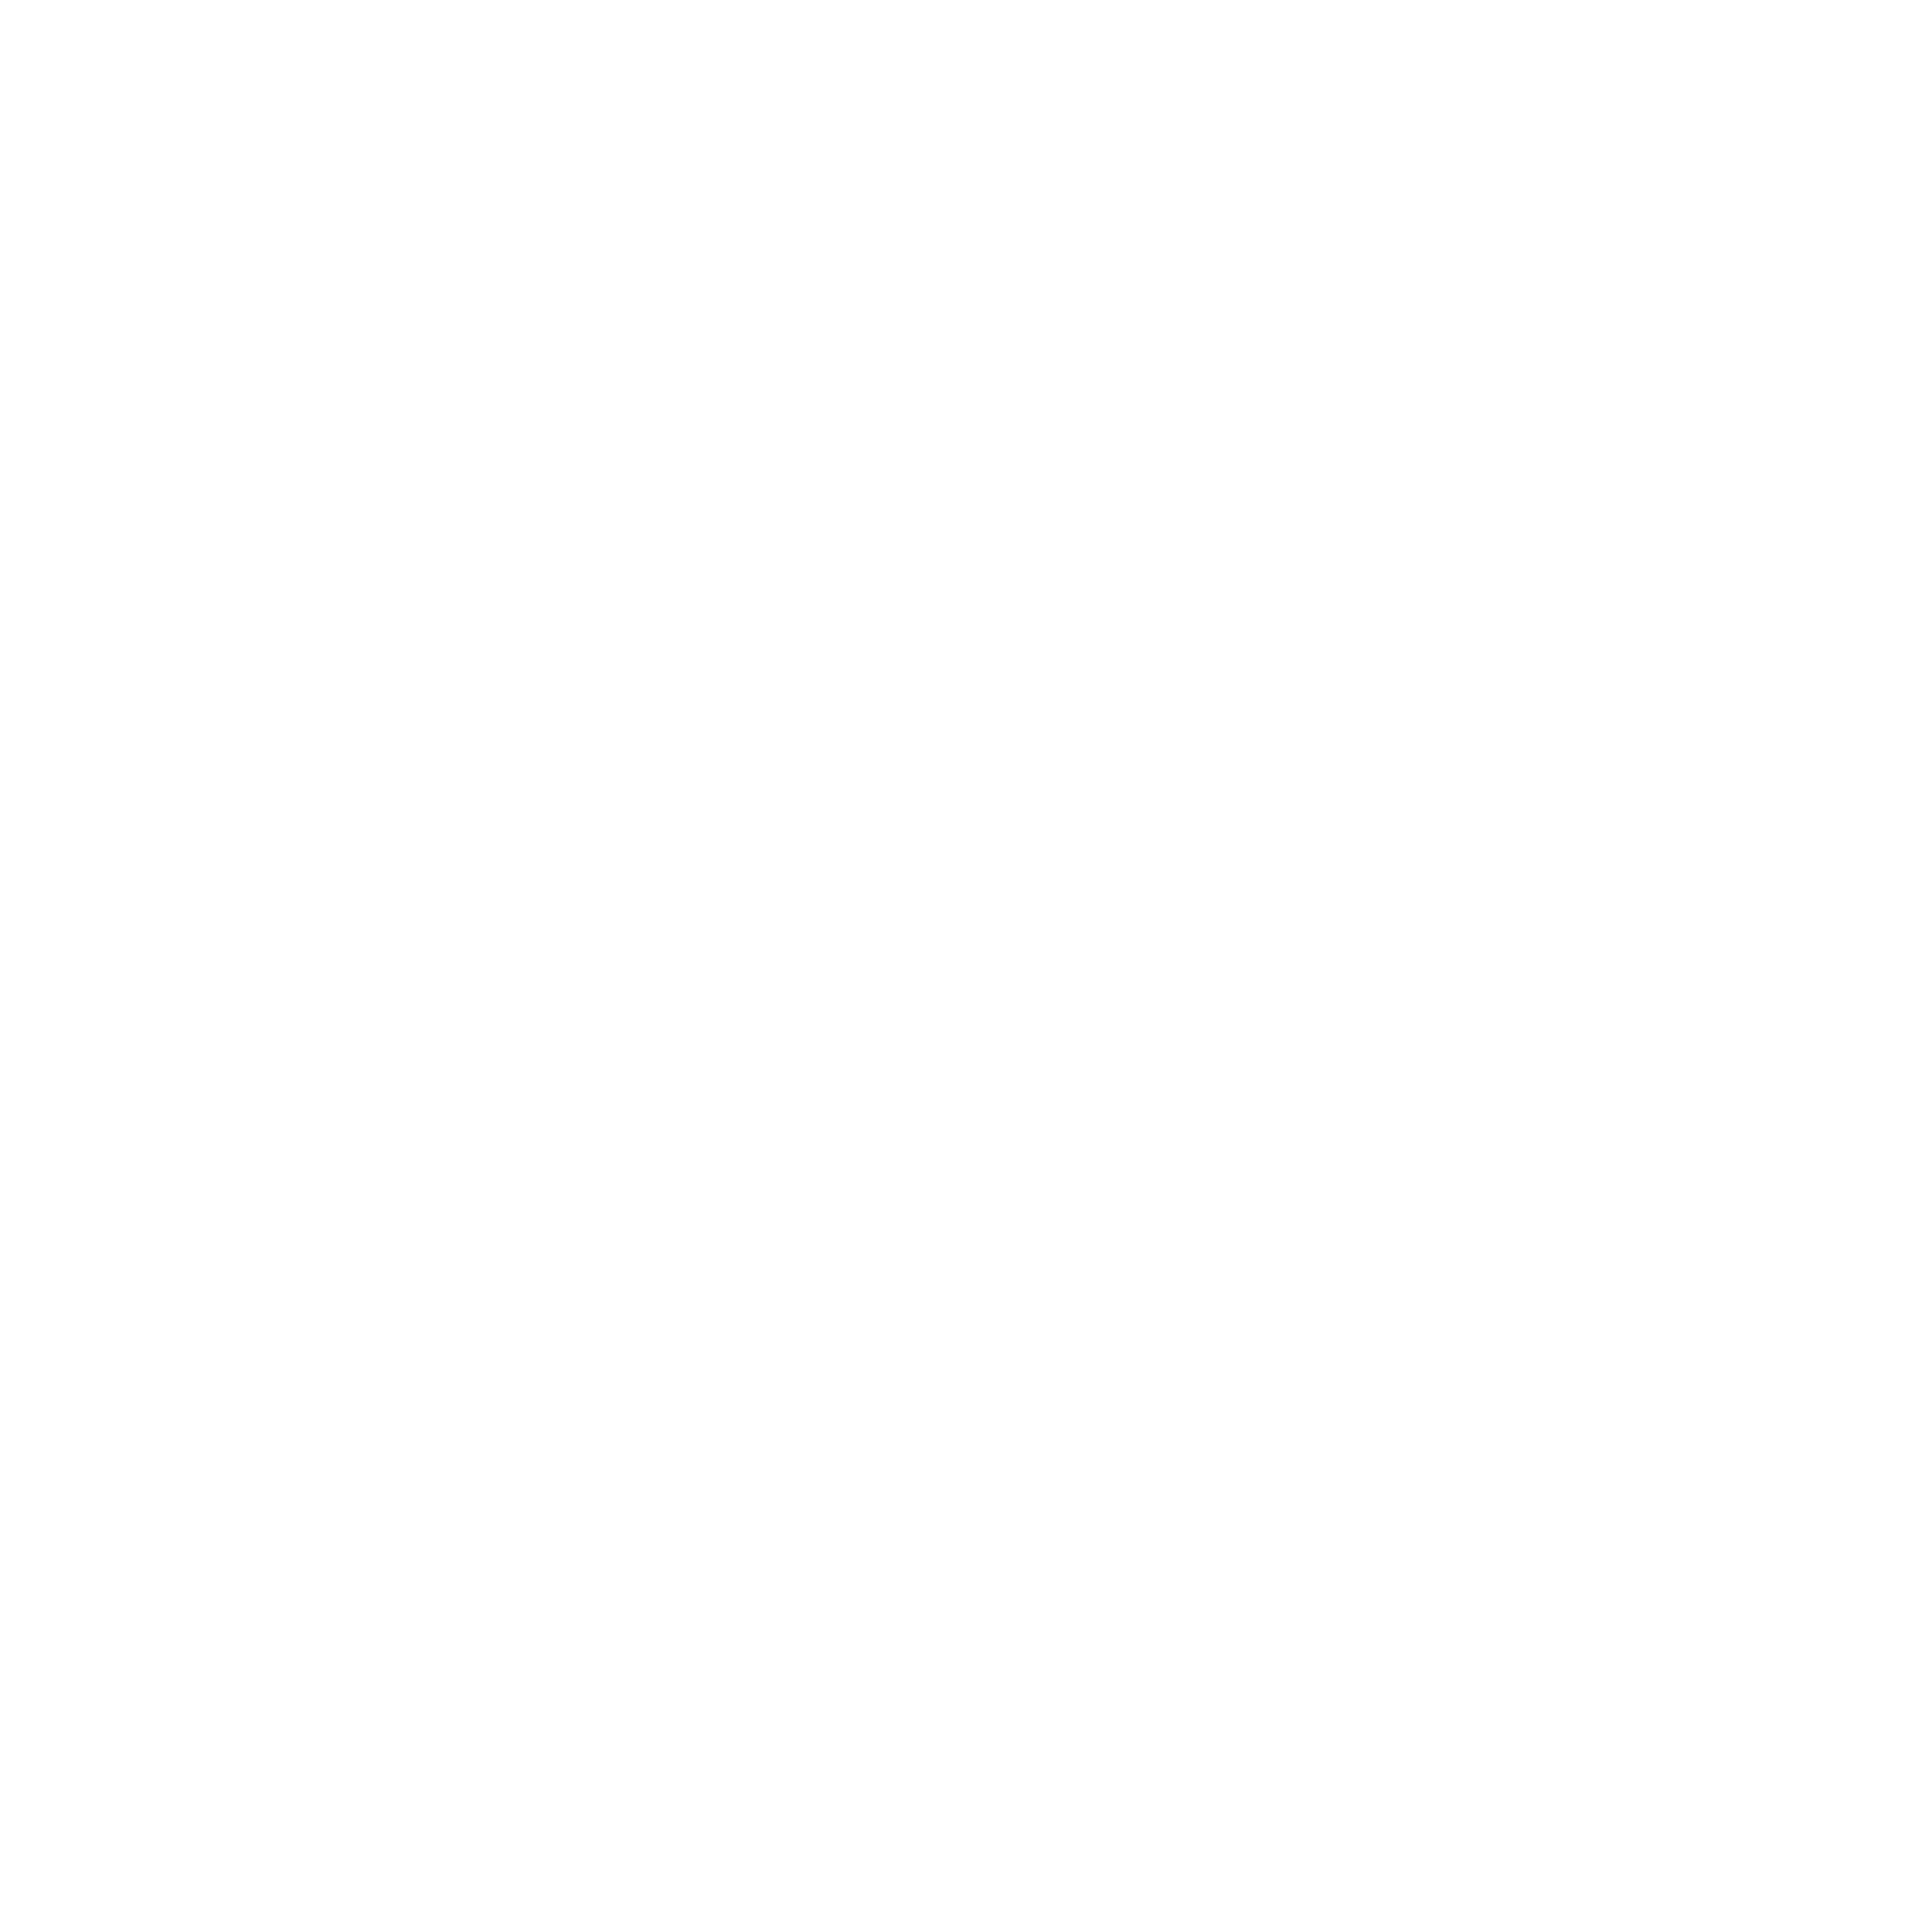 Profiles-White_HR35